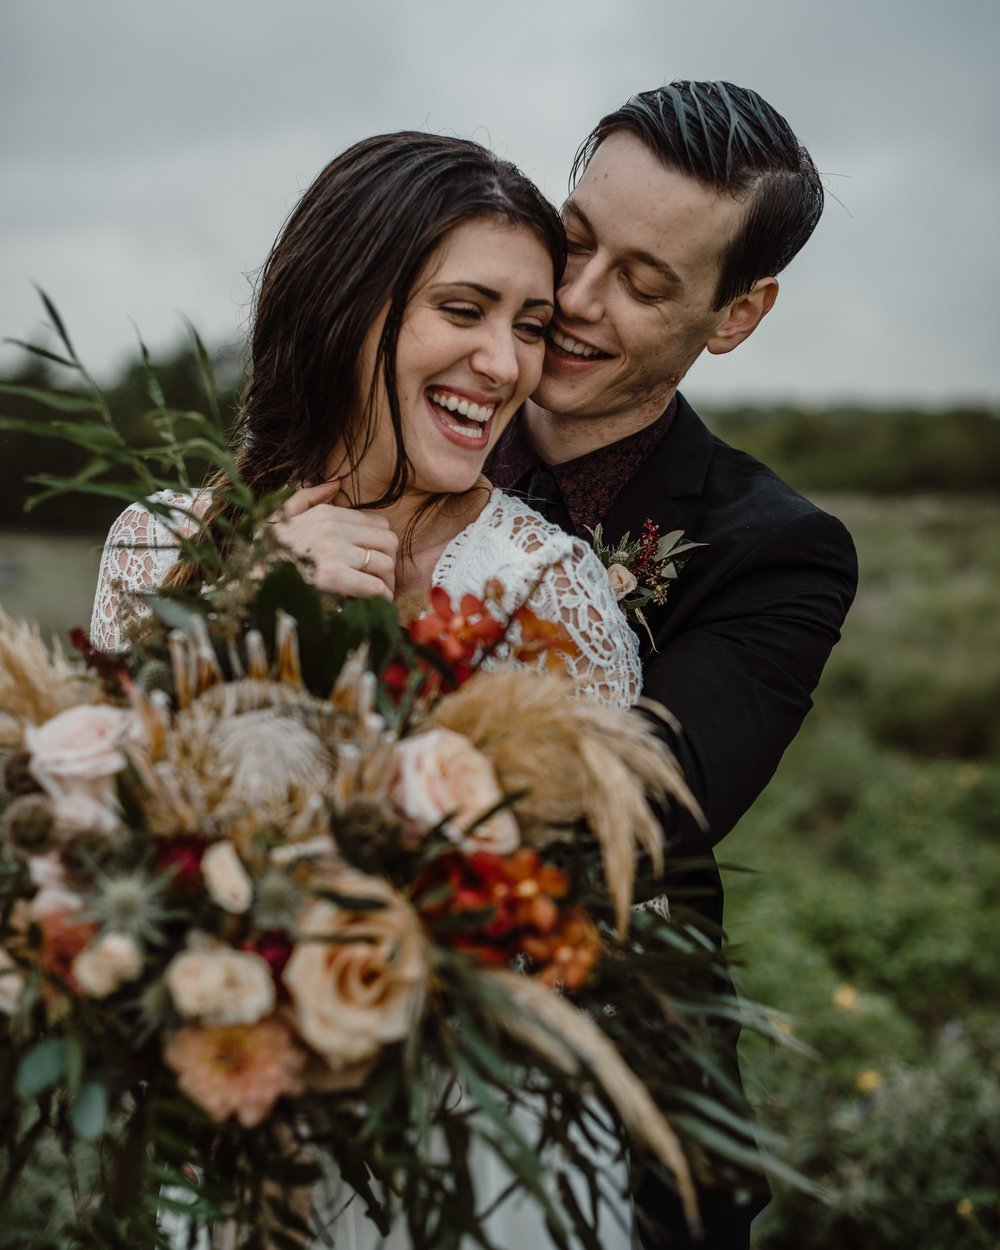 elopementandintimateweddingphotographer-4.jpg